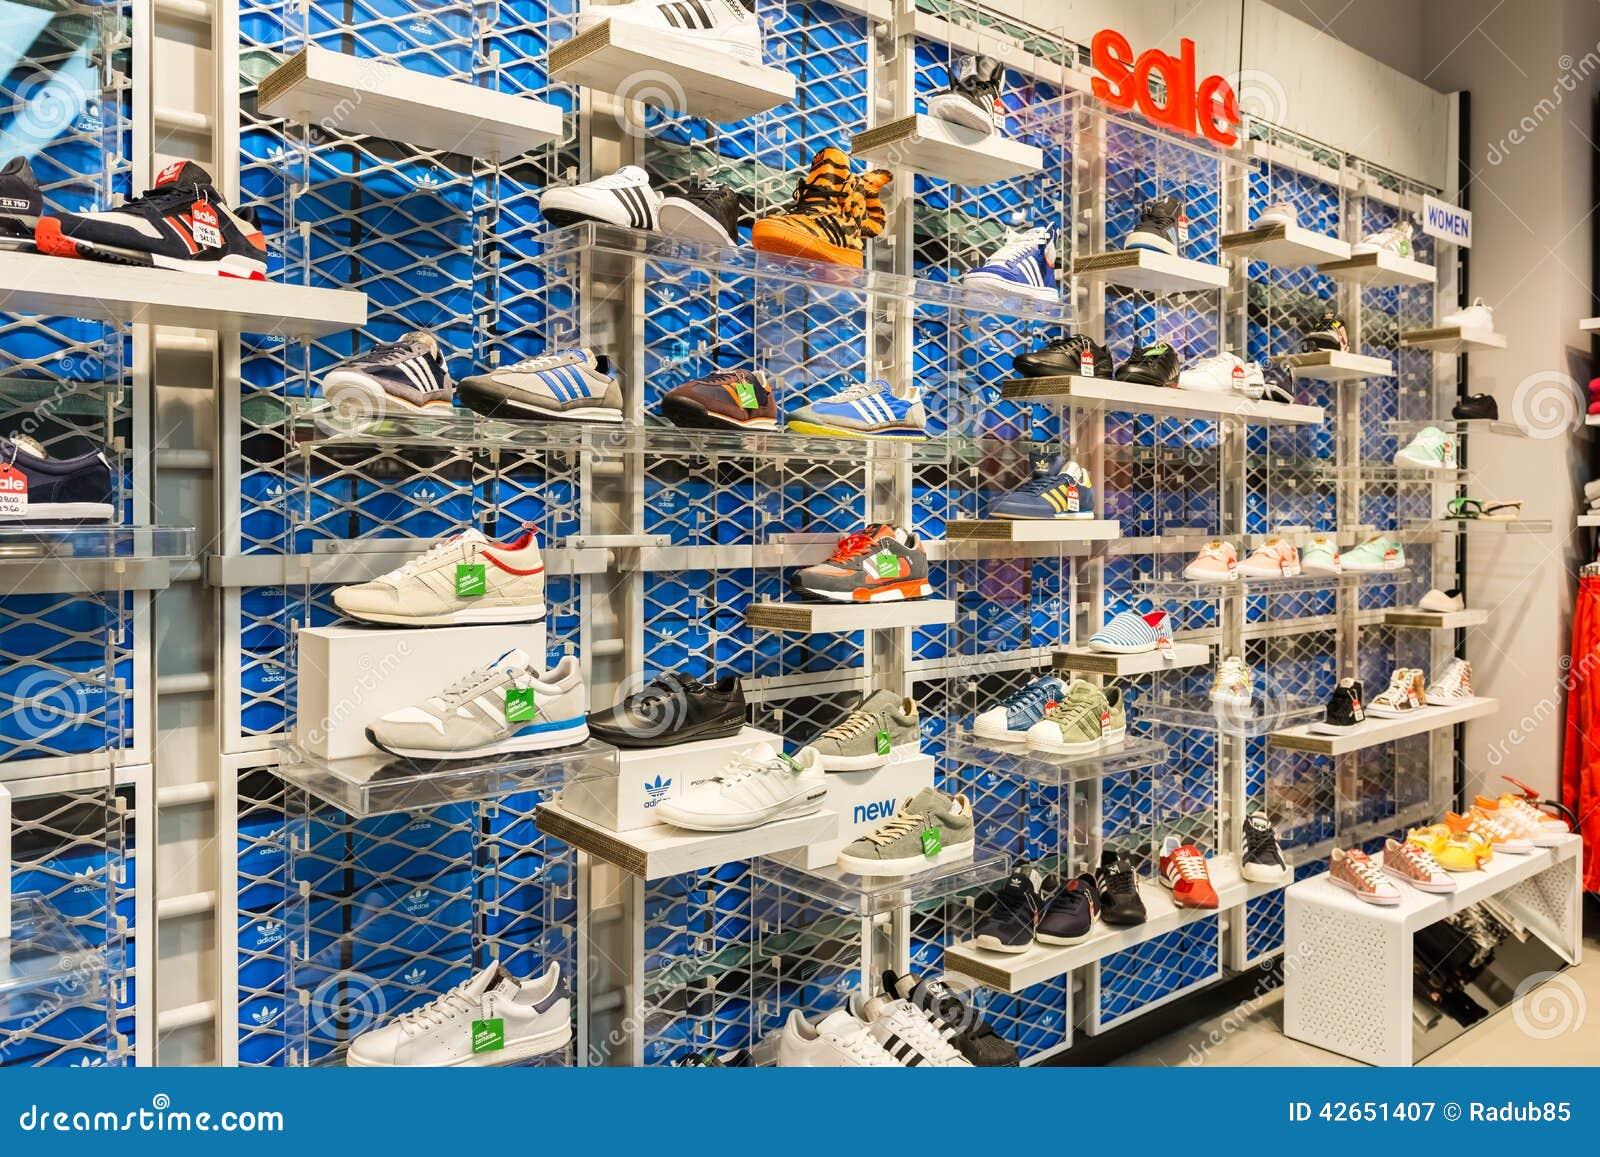 adidas shoe store